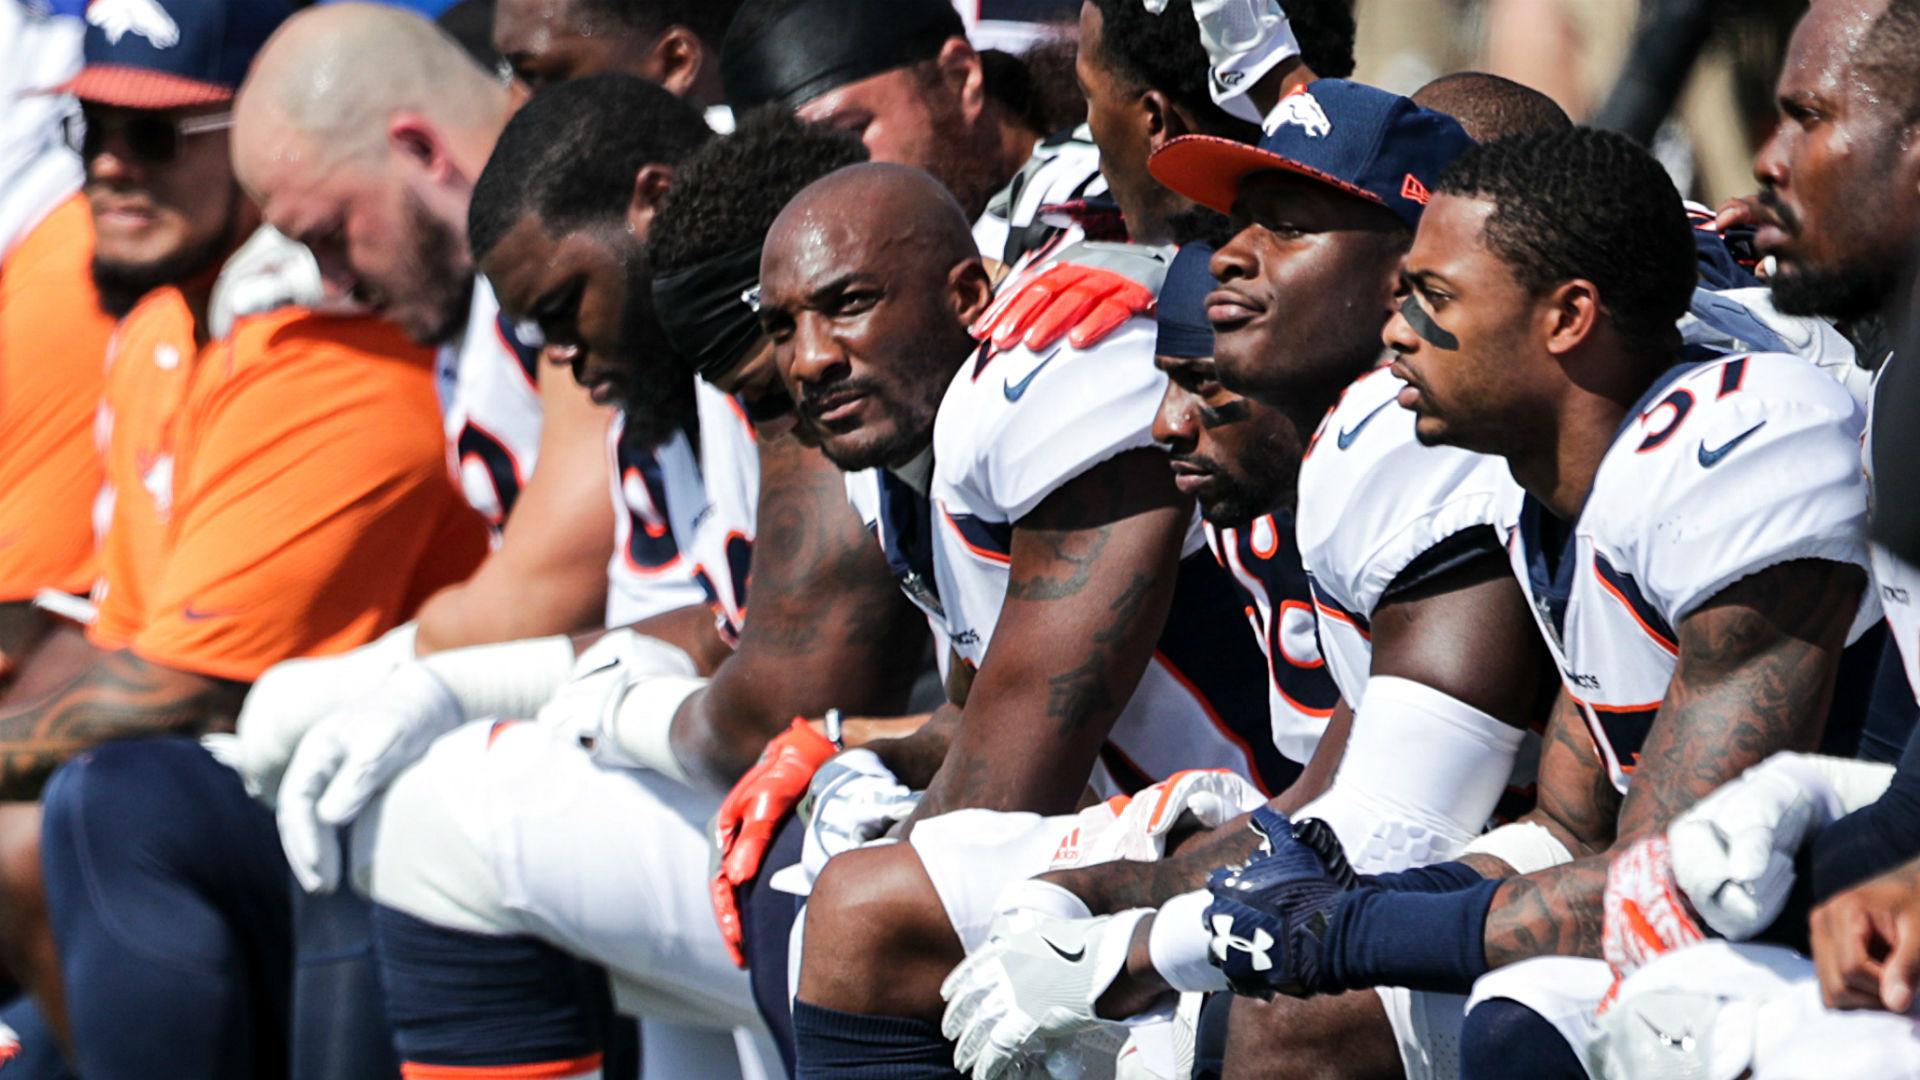 Broncos players release statement regarding Trump comments